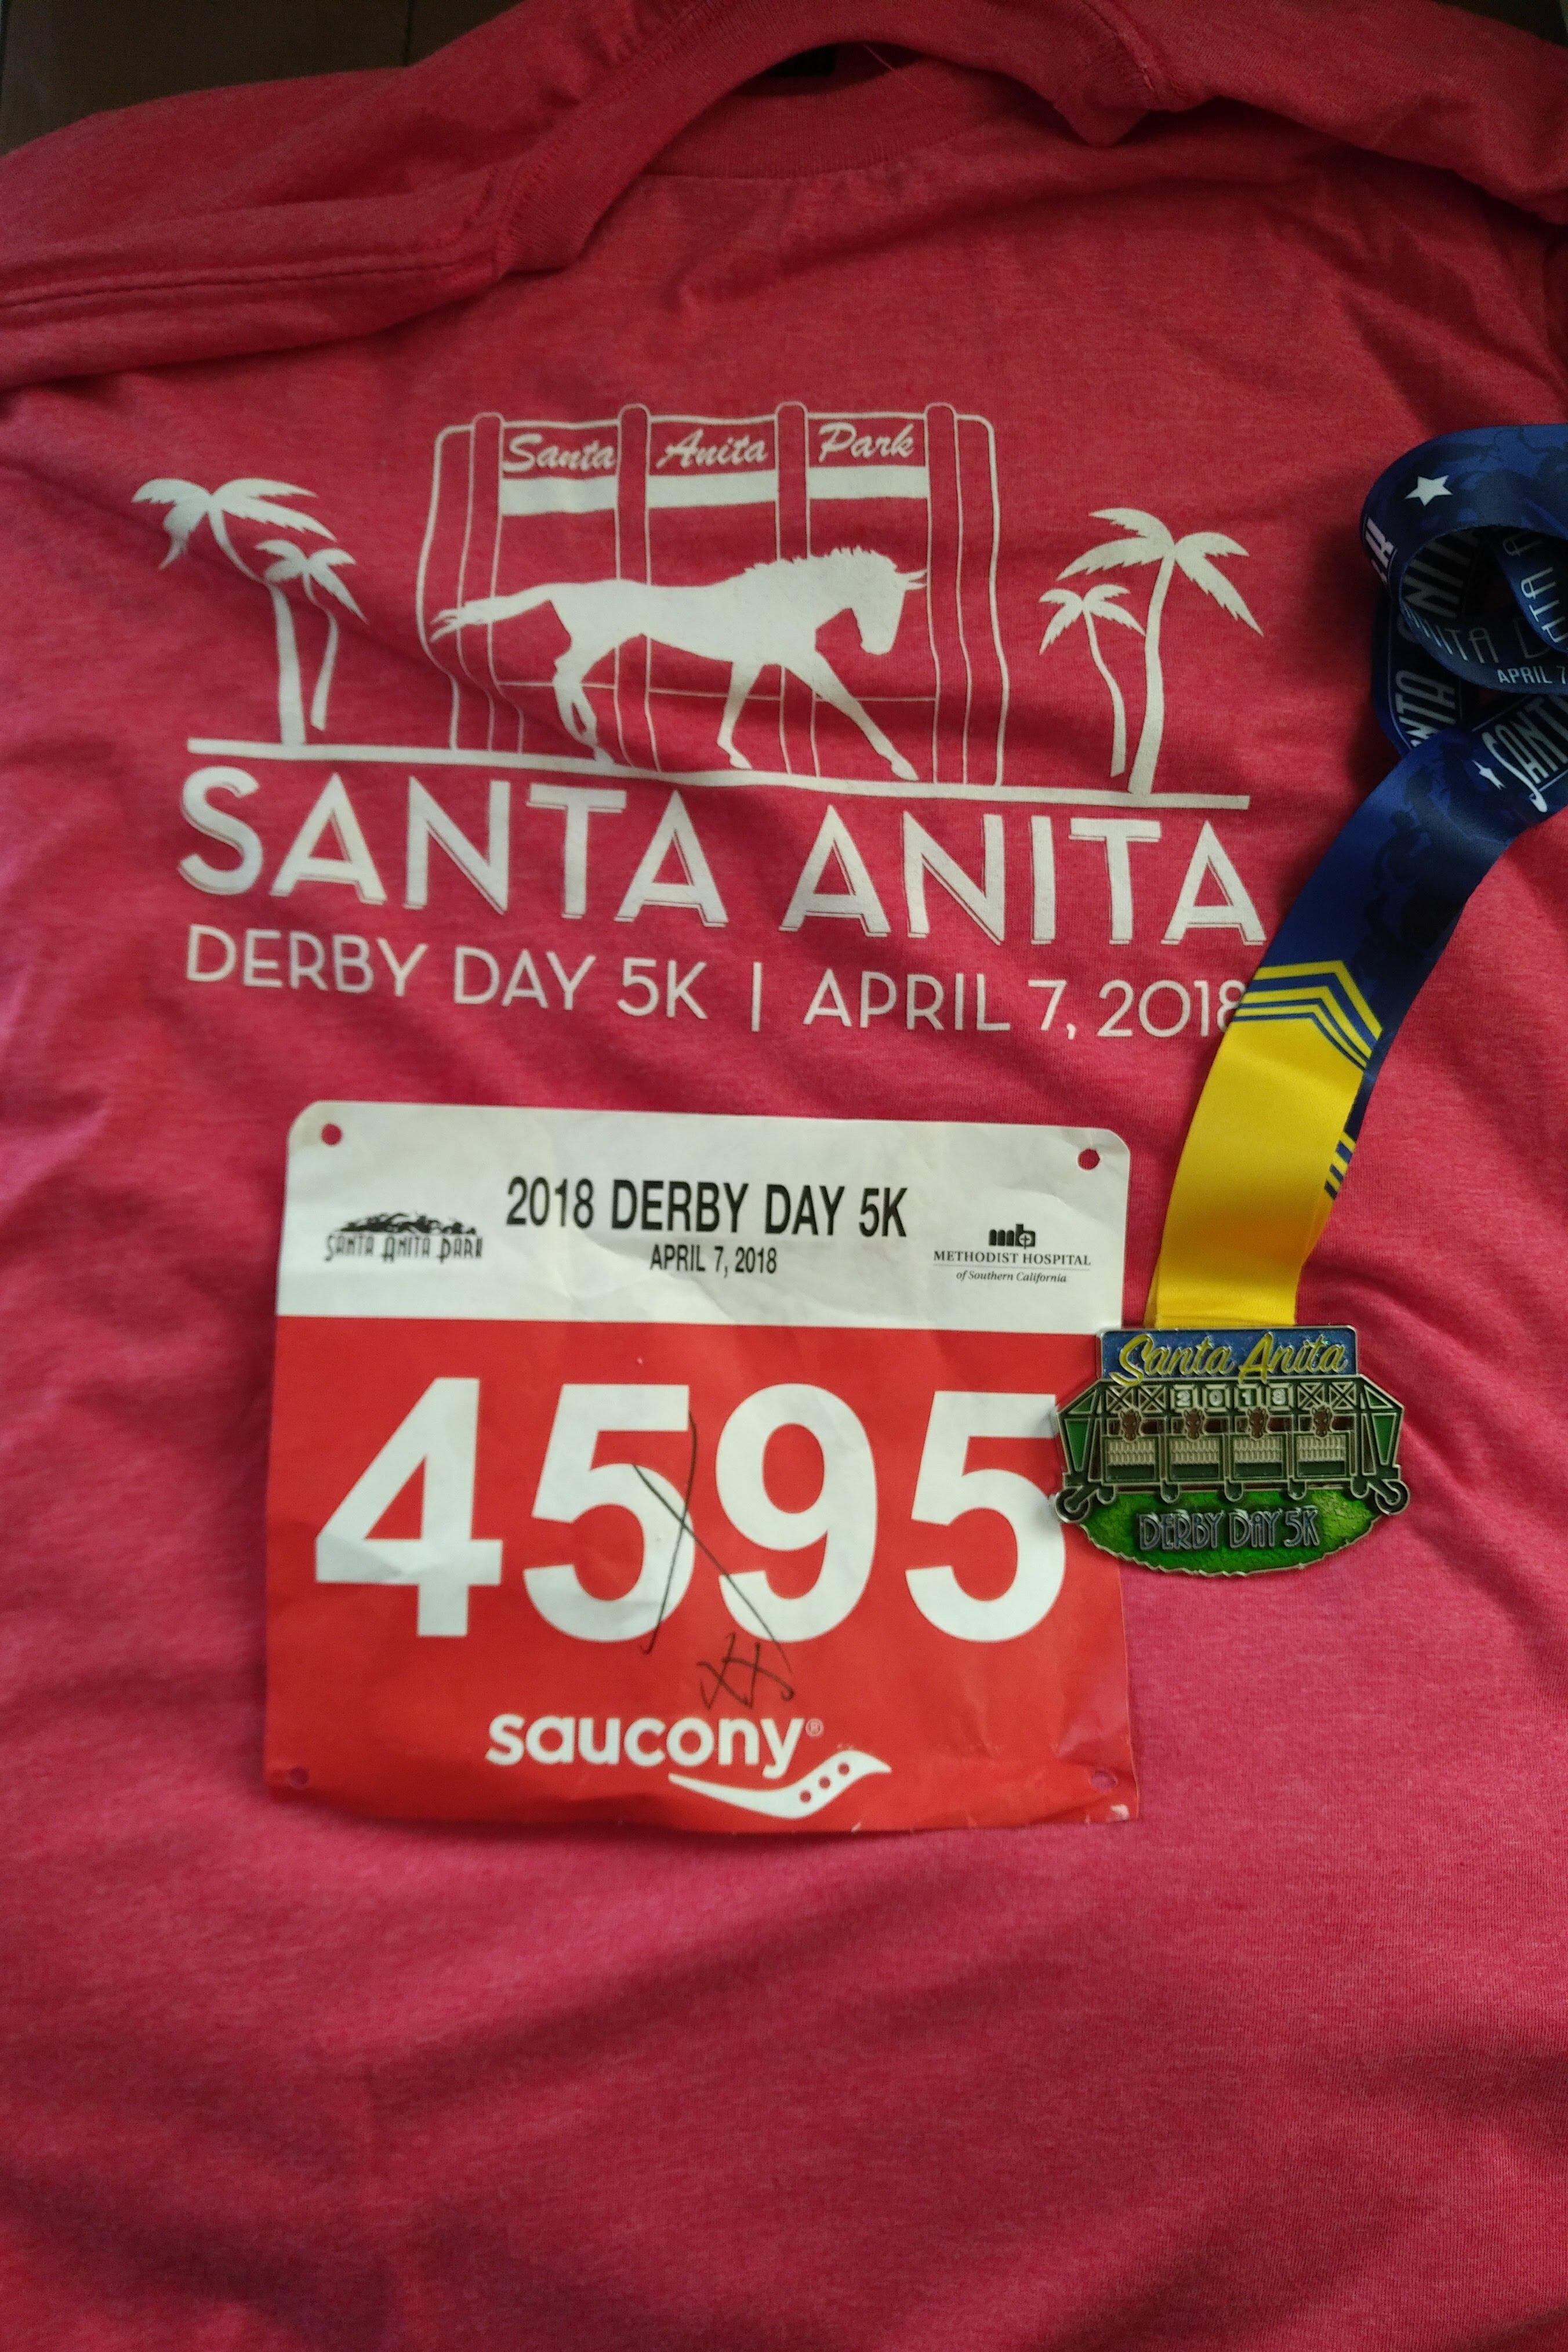 2018 Santa Anita Derby Day 5k